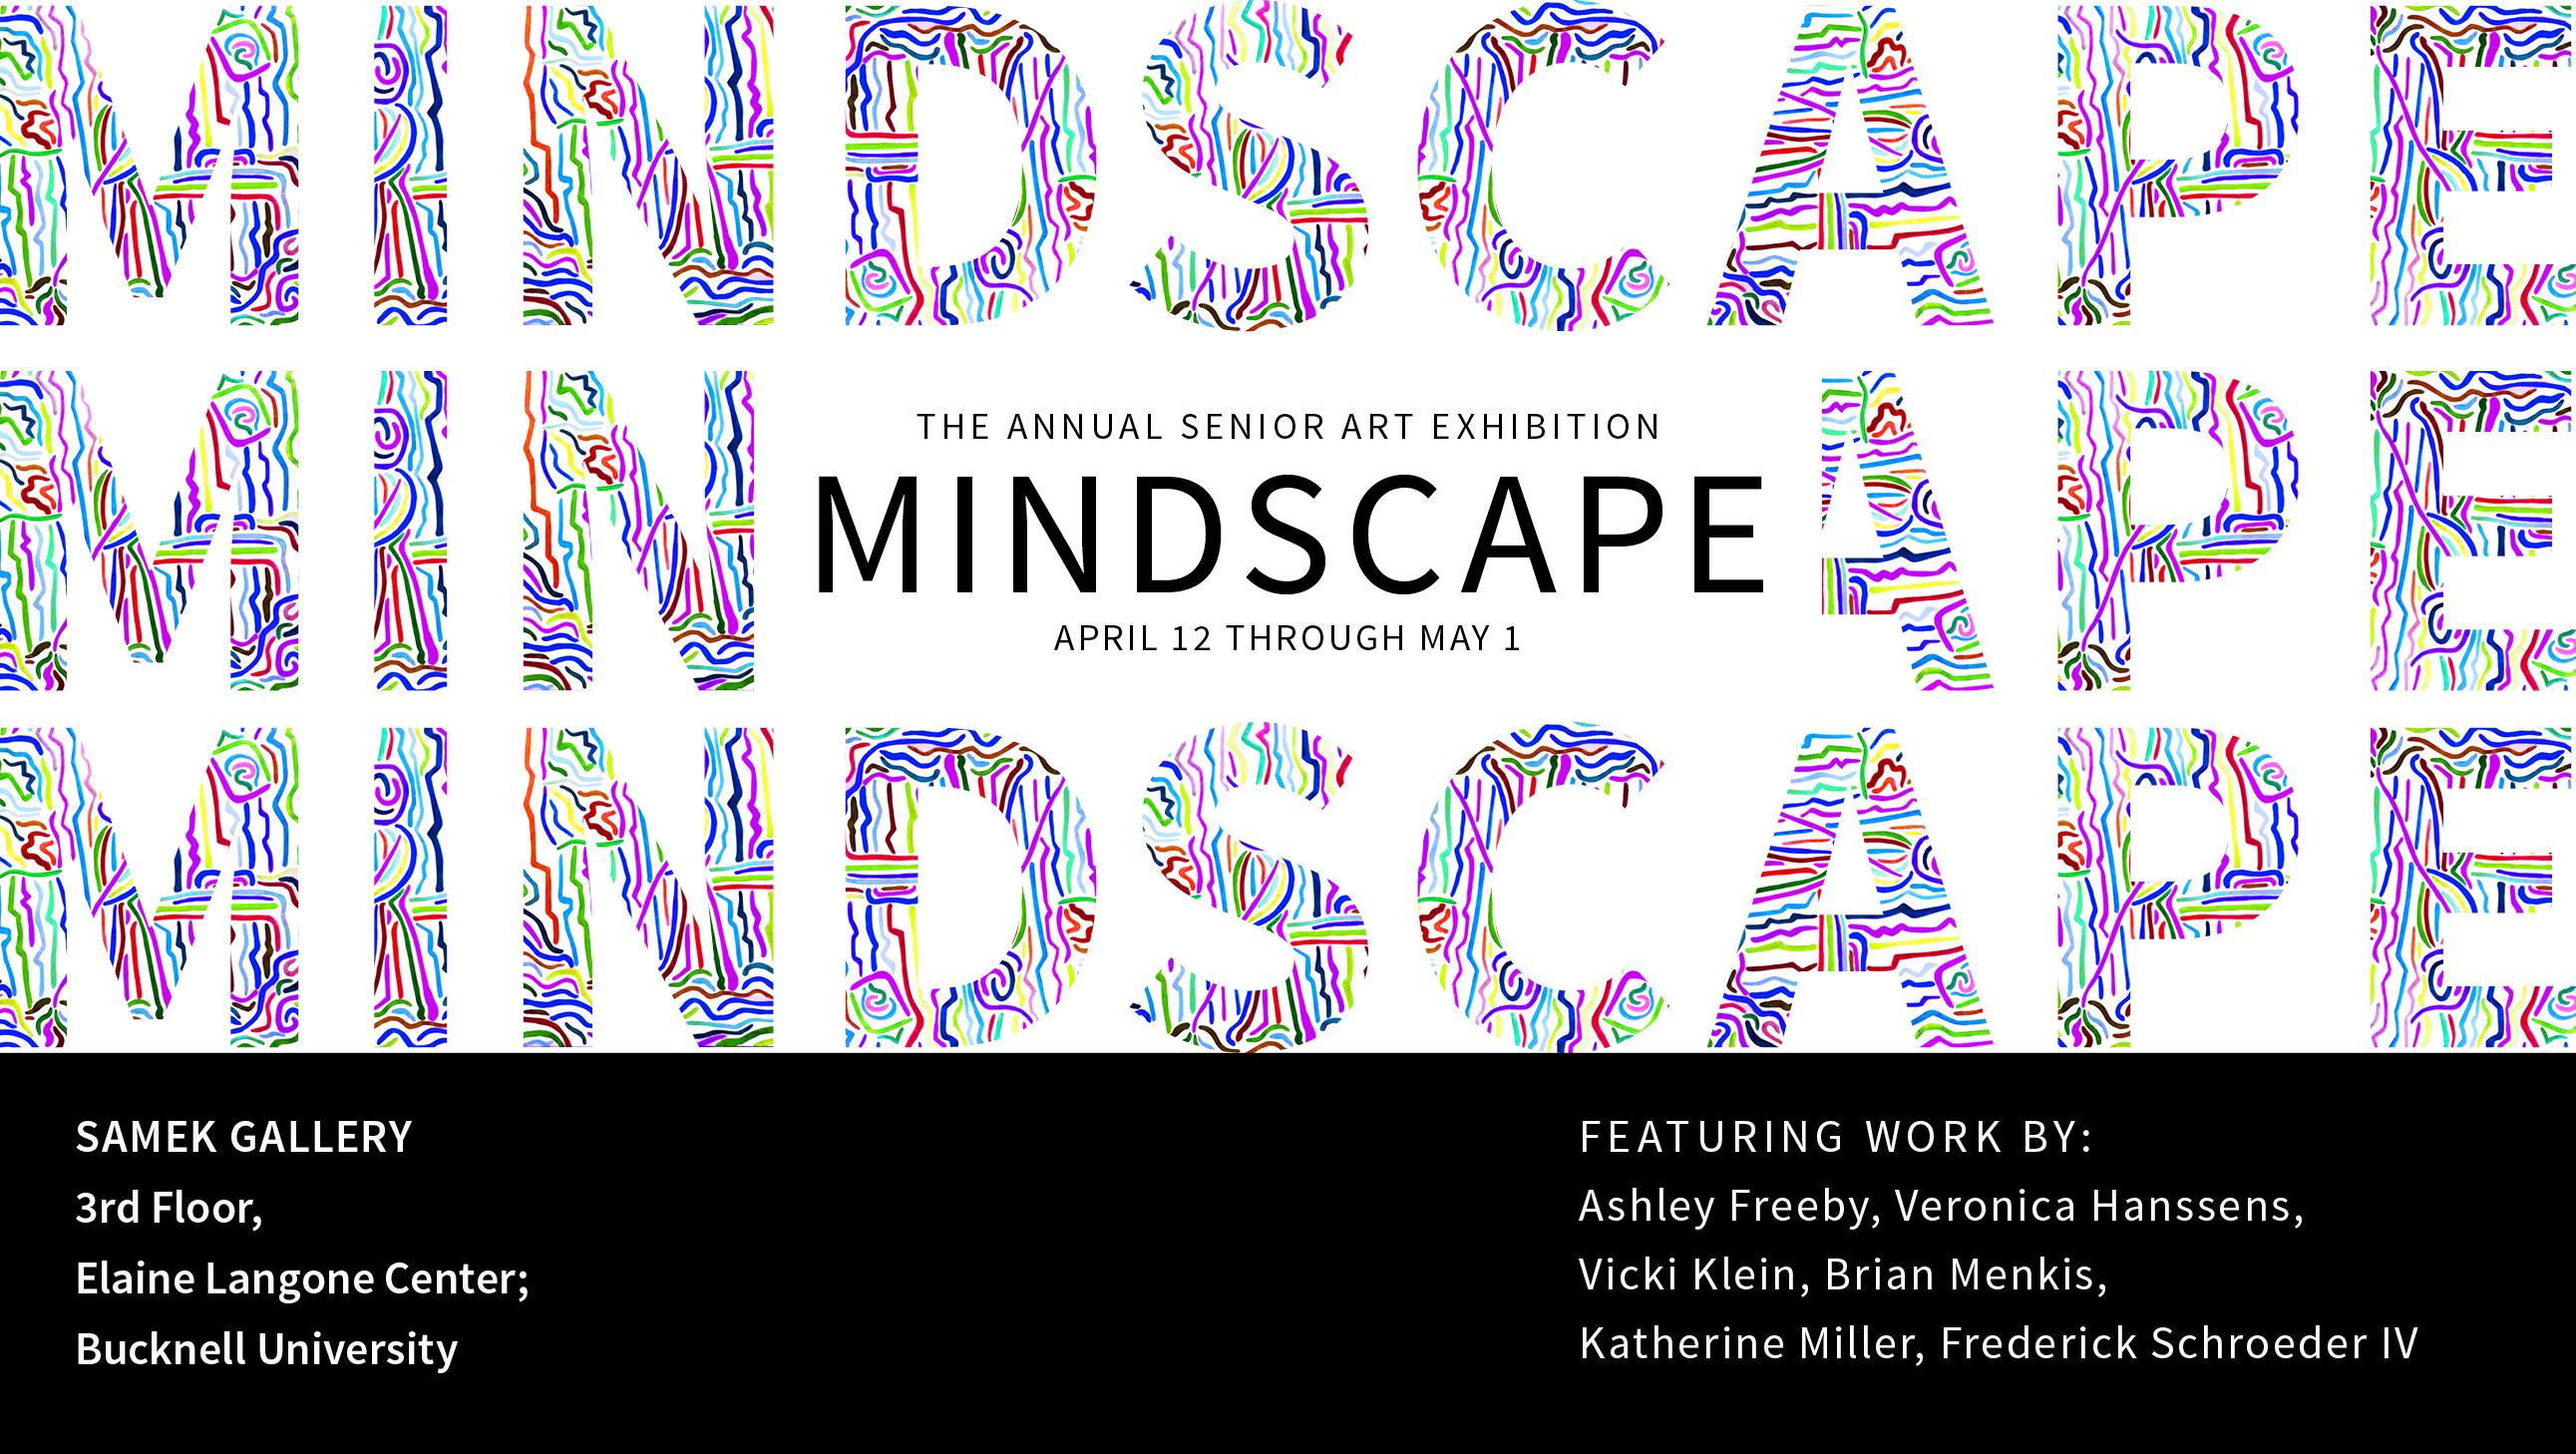 Mindscape: The Annual Senior Student Art Exhibition